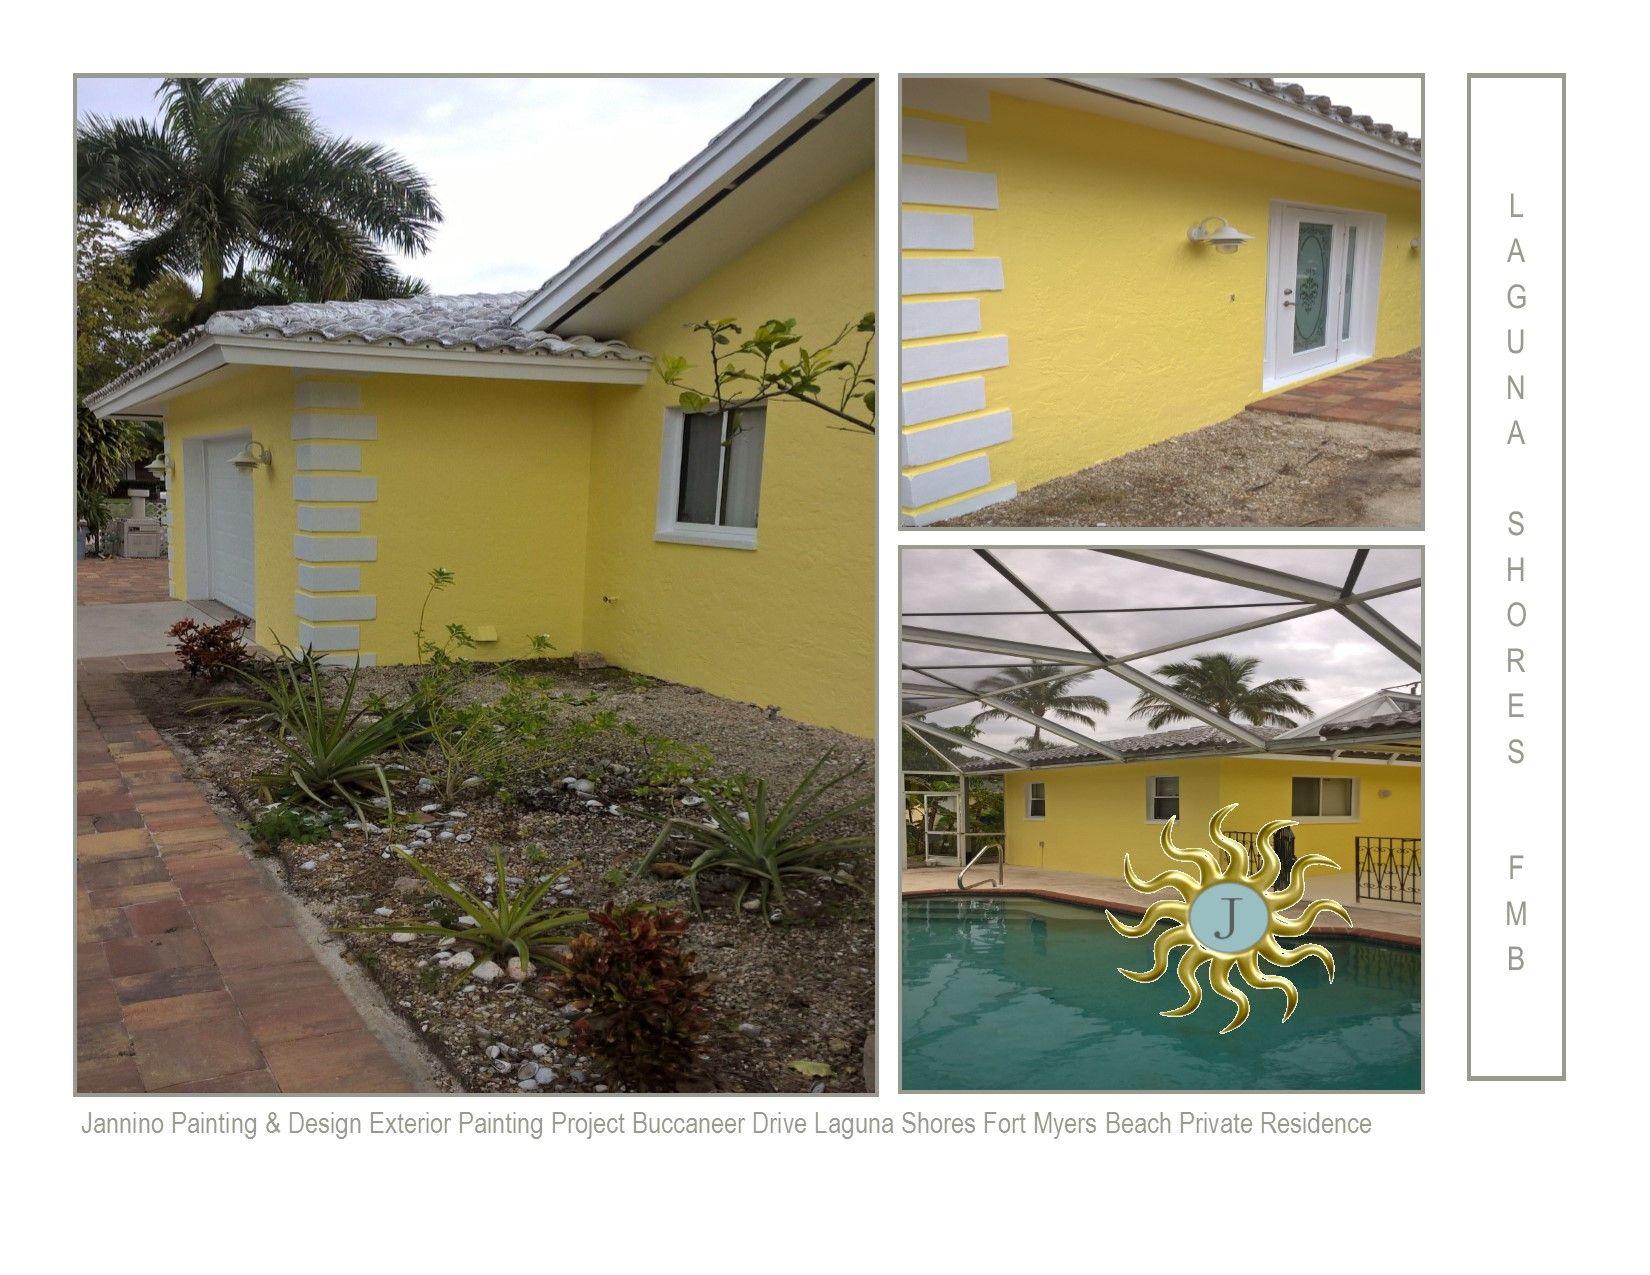 Exterior Painting Laguna Shores Fmb Redington Shores Indian Rocks Beach Fl Island House House Painting Fort Myers Beach